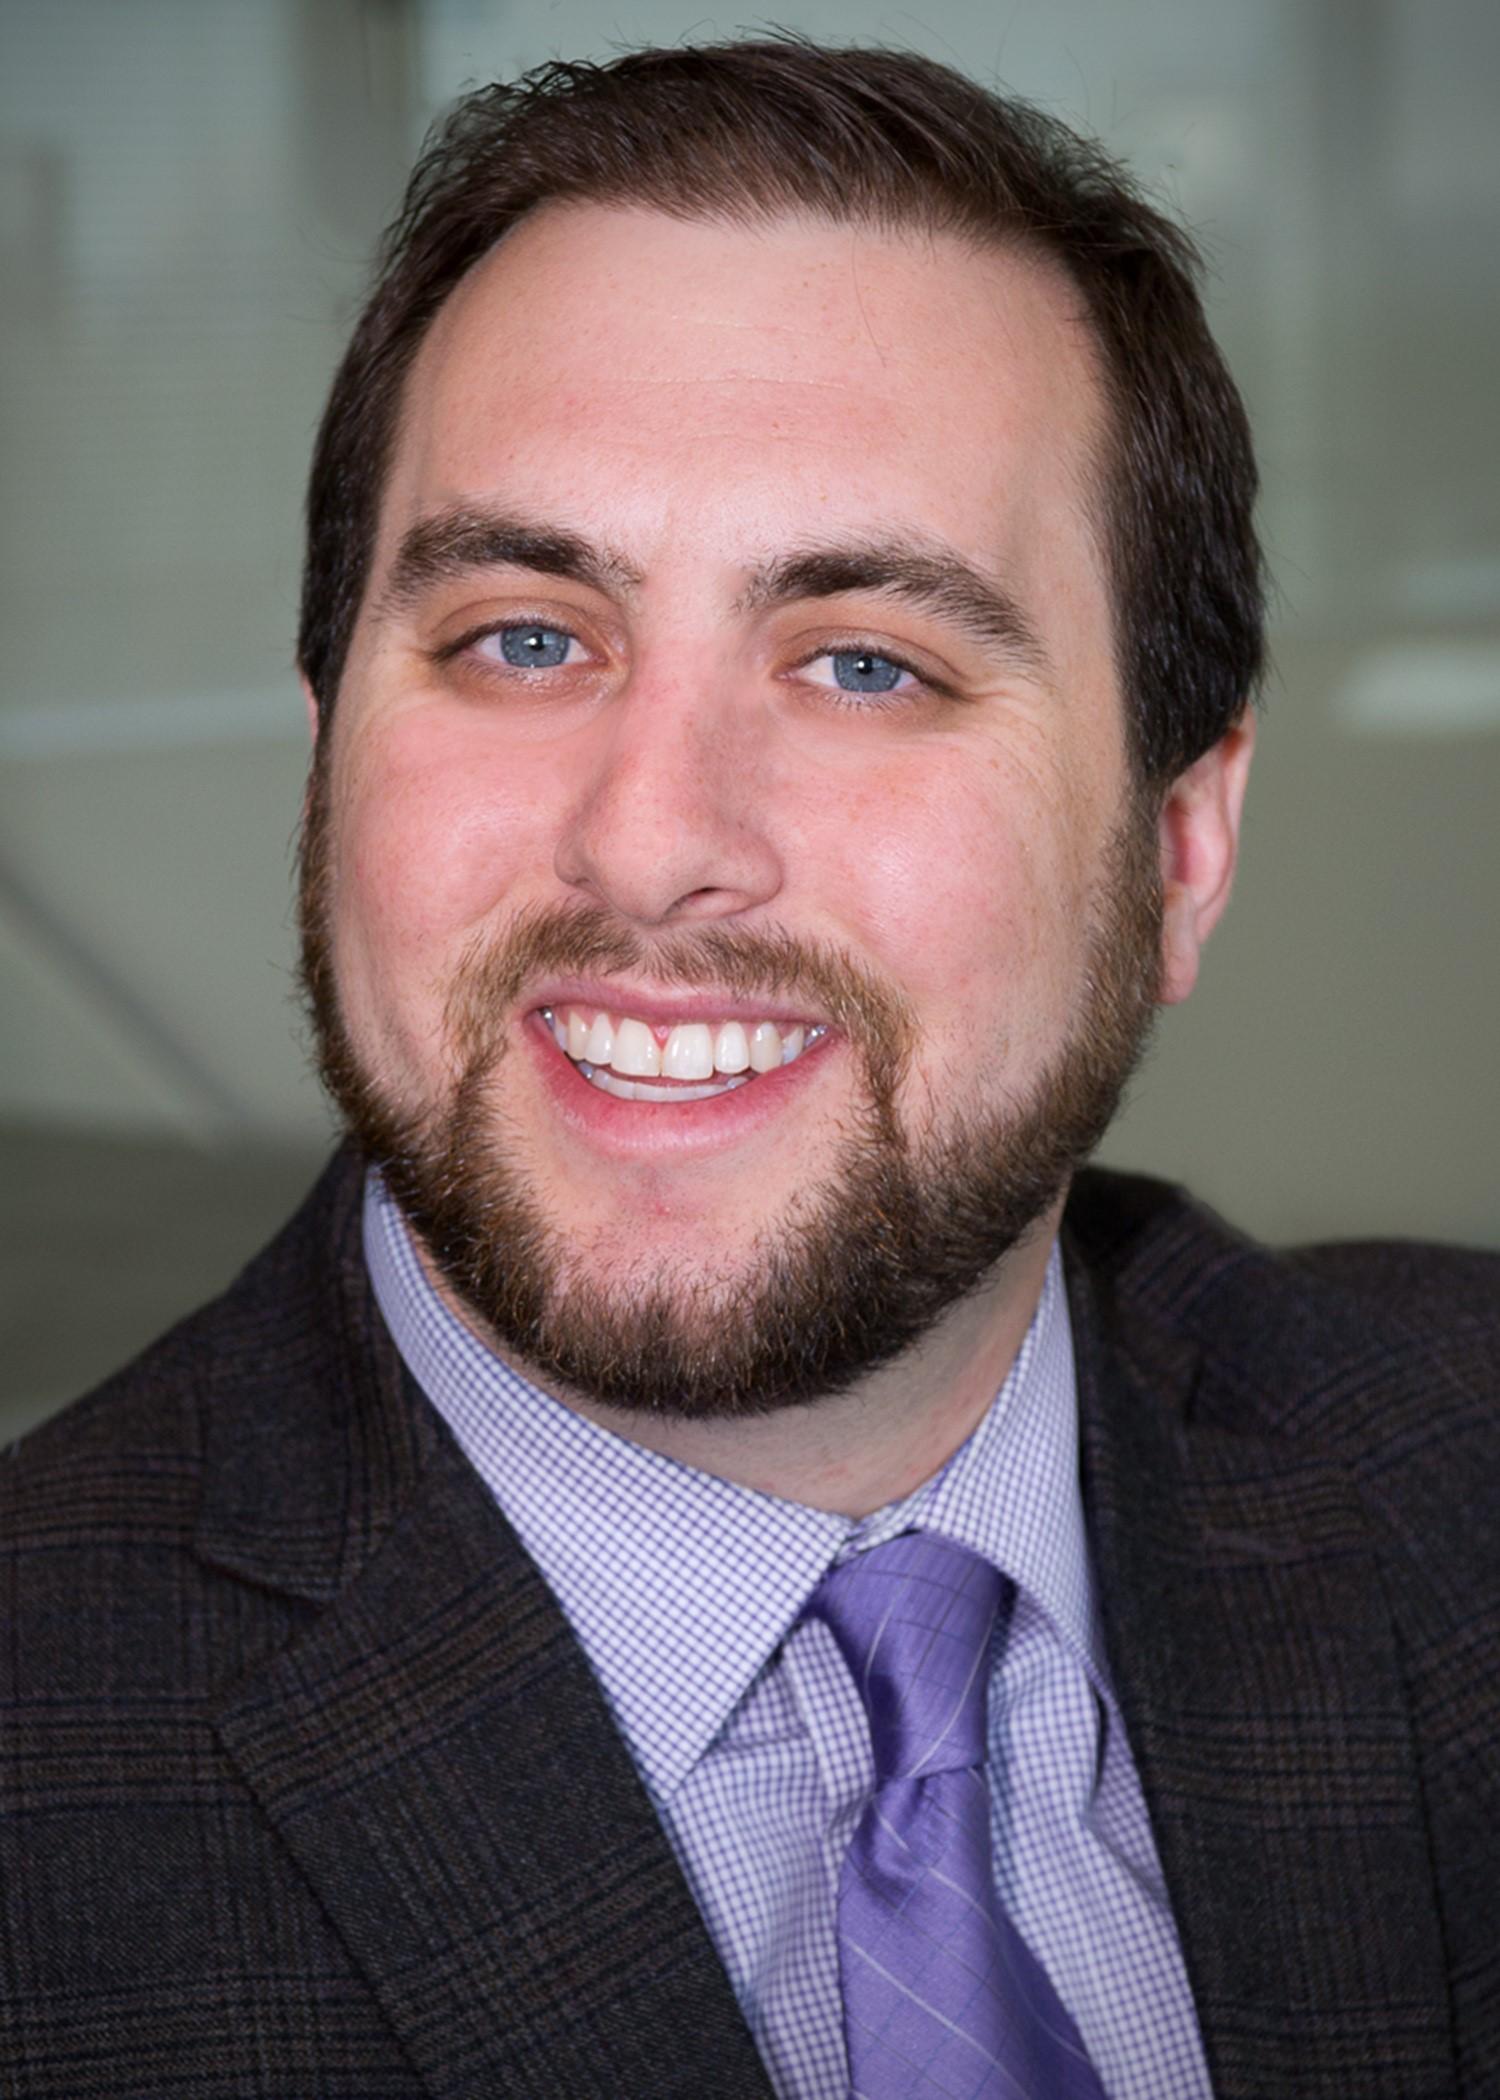 Adam Mesirow